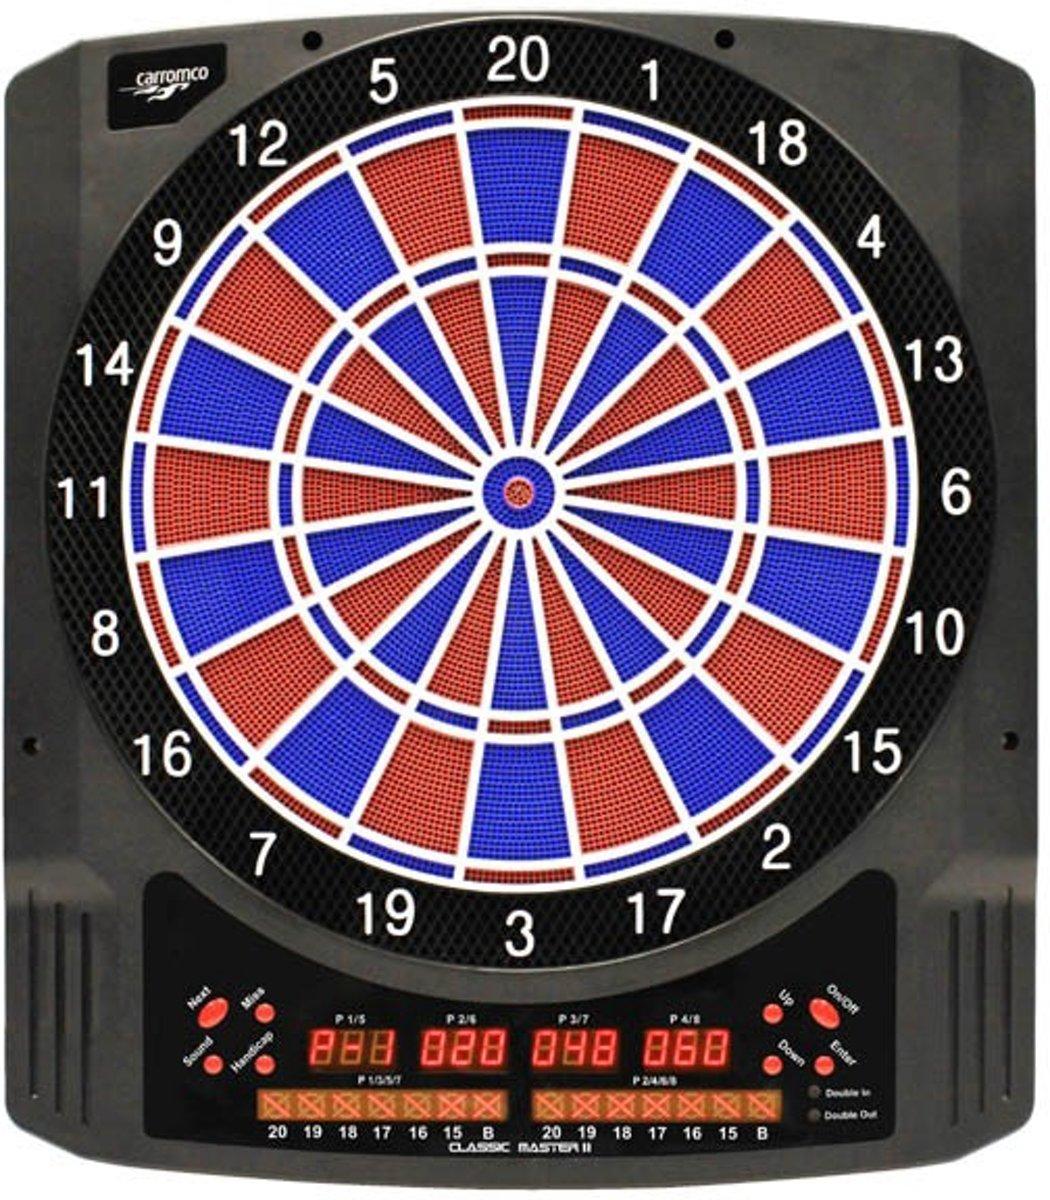 ABC Darts Elektronisch Dartbord - Classic Master II